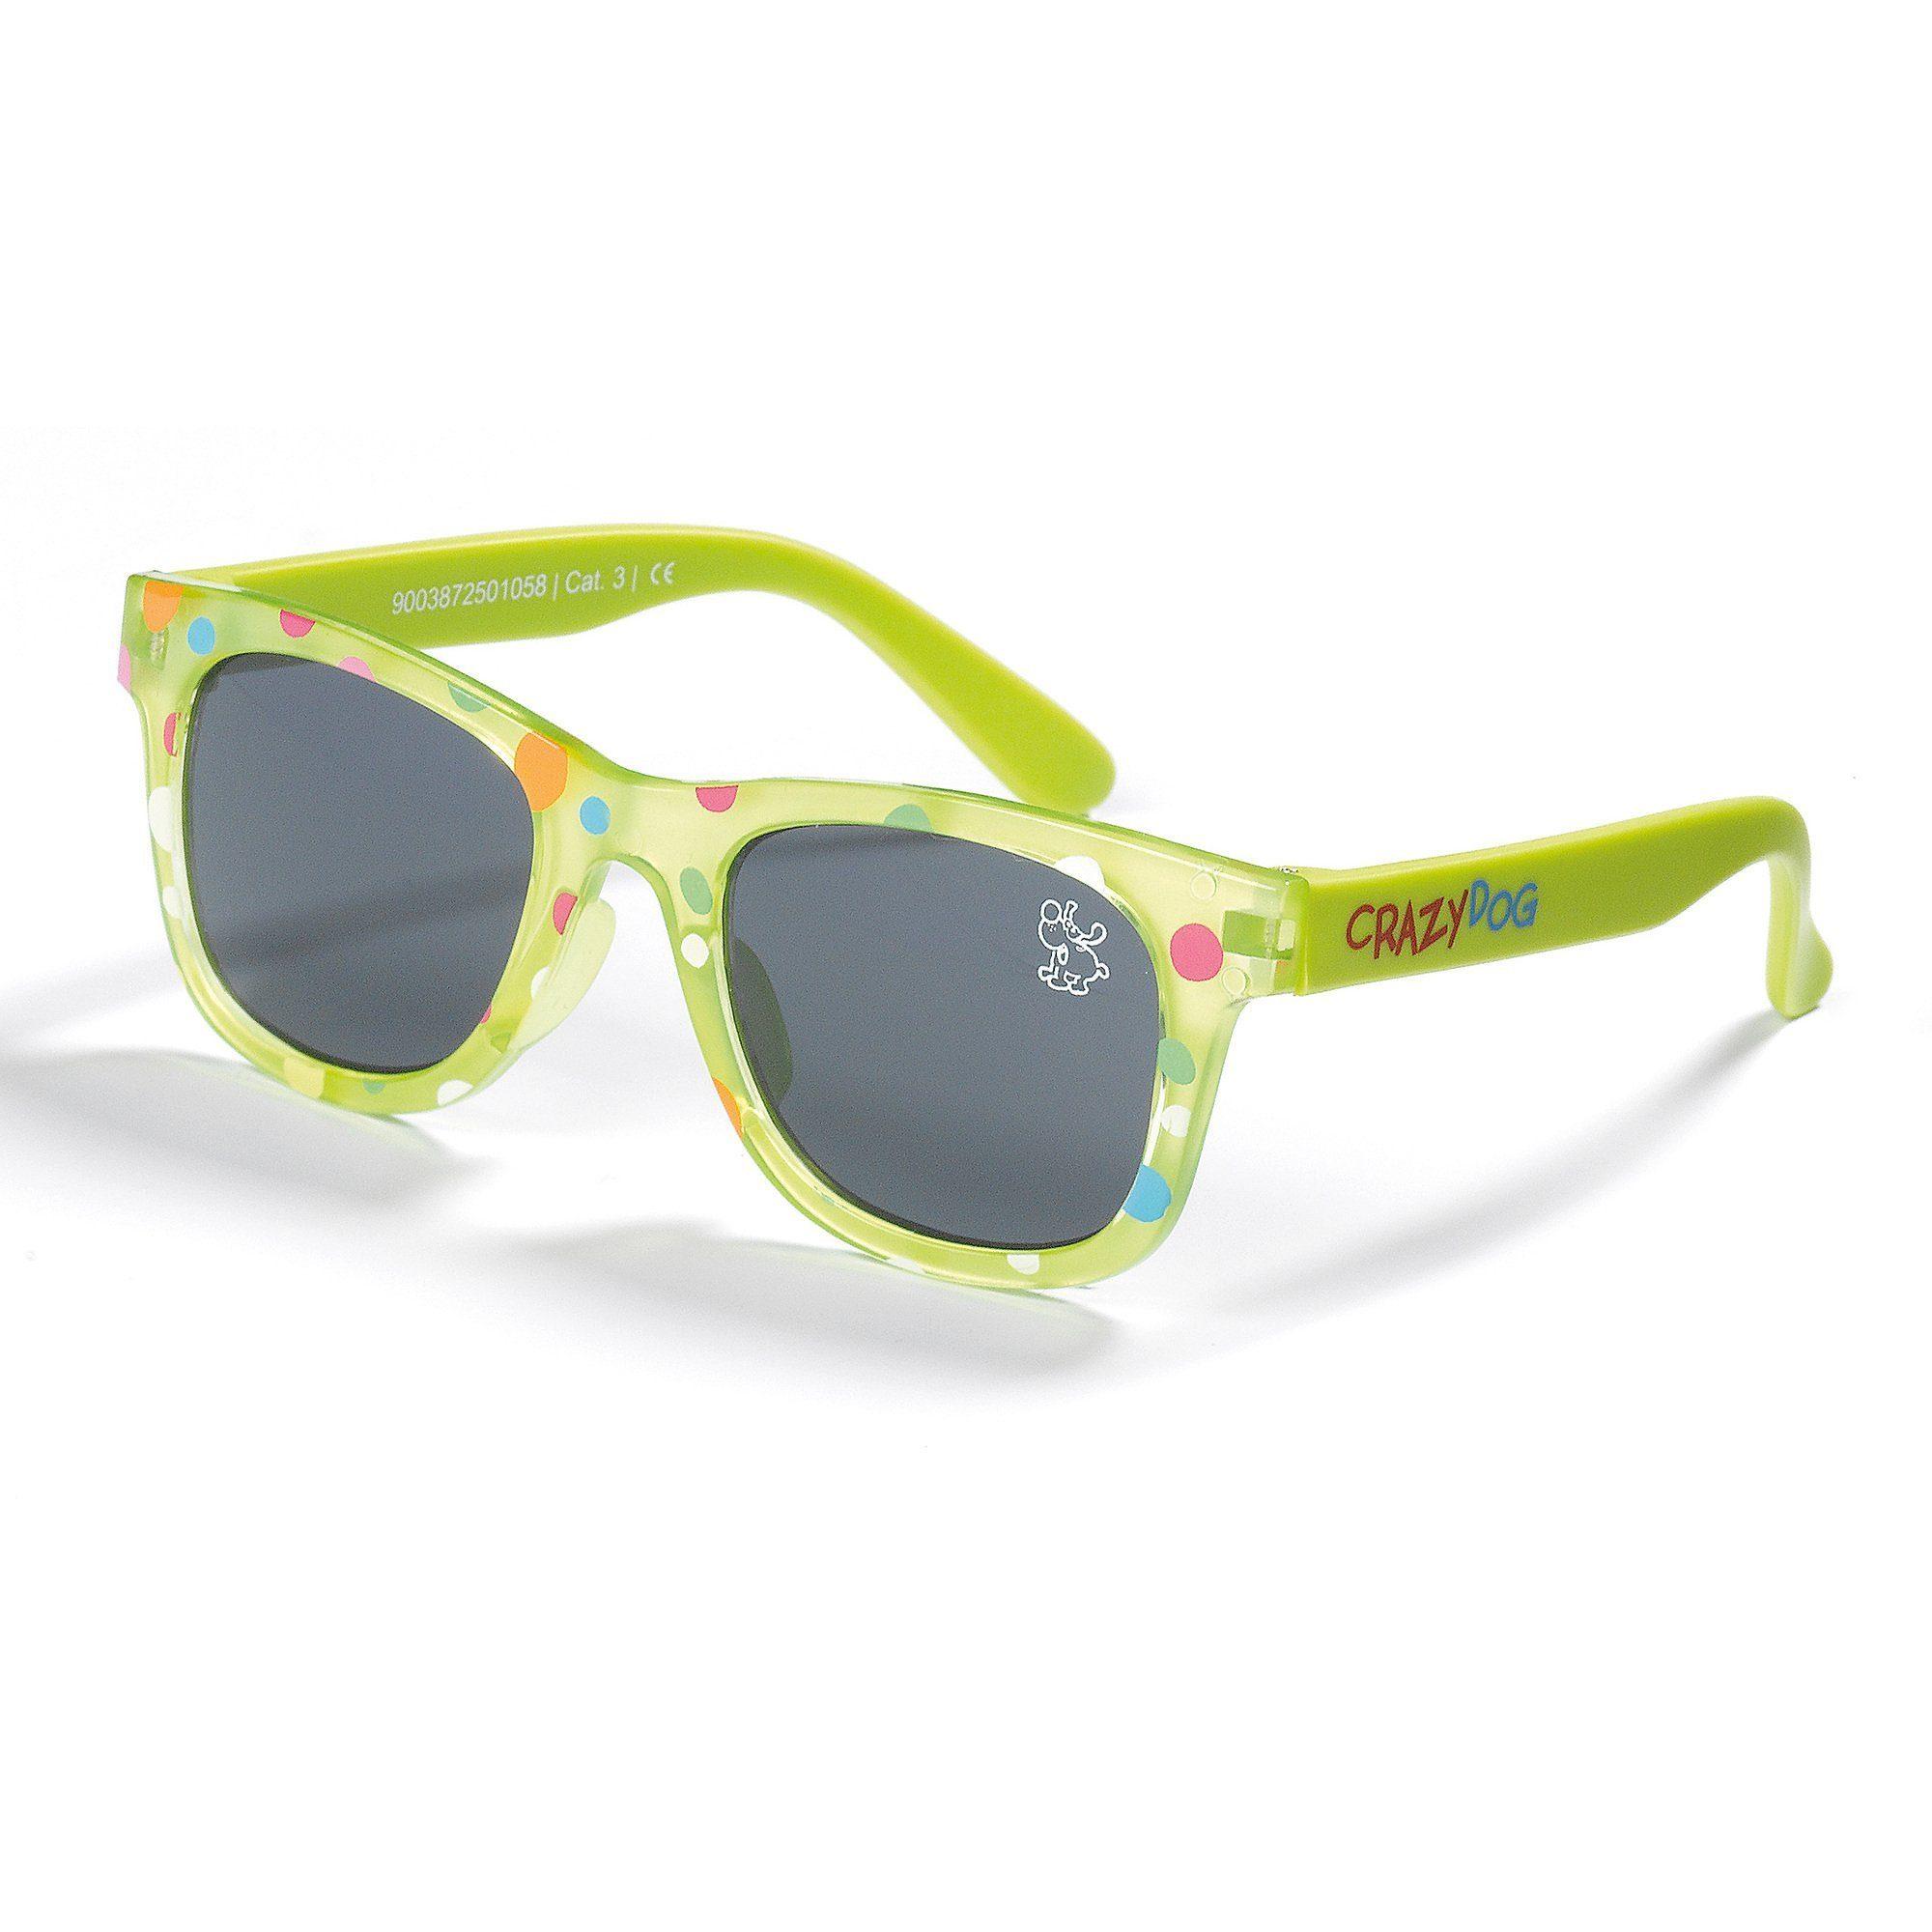 BABY-WALZ Kinder-Sonnenbrille Style